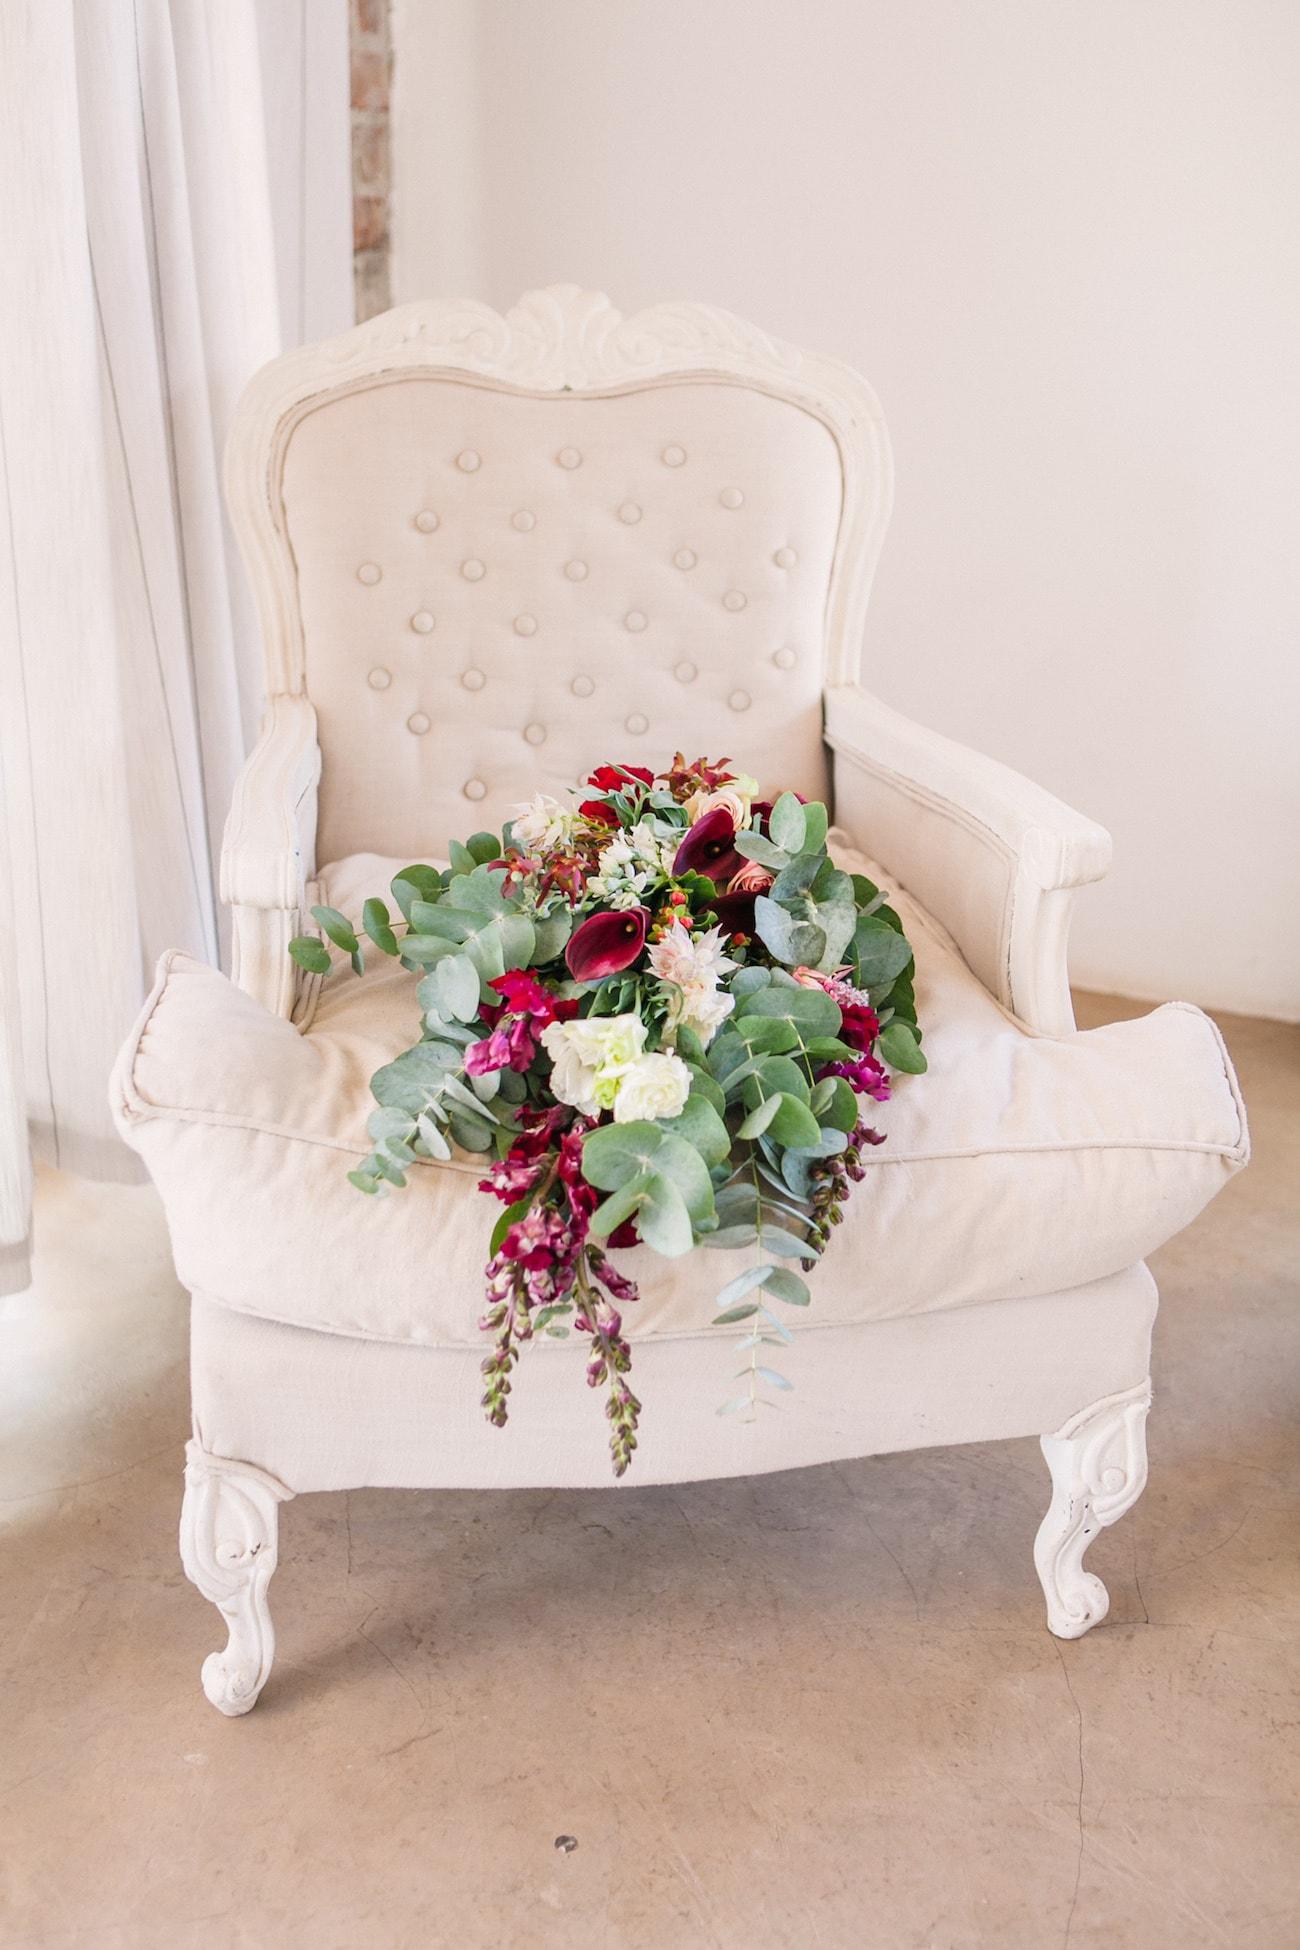 Jewel Tone Bouquet | Joyous Jewel Tone Winter Wedding | Credit: Dust and Dreams Photography